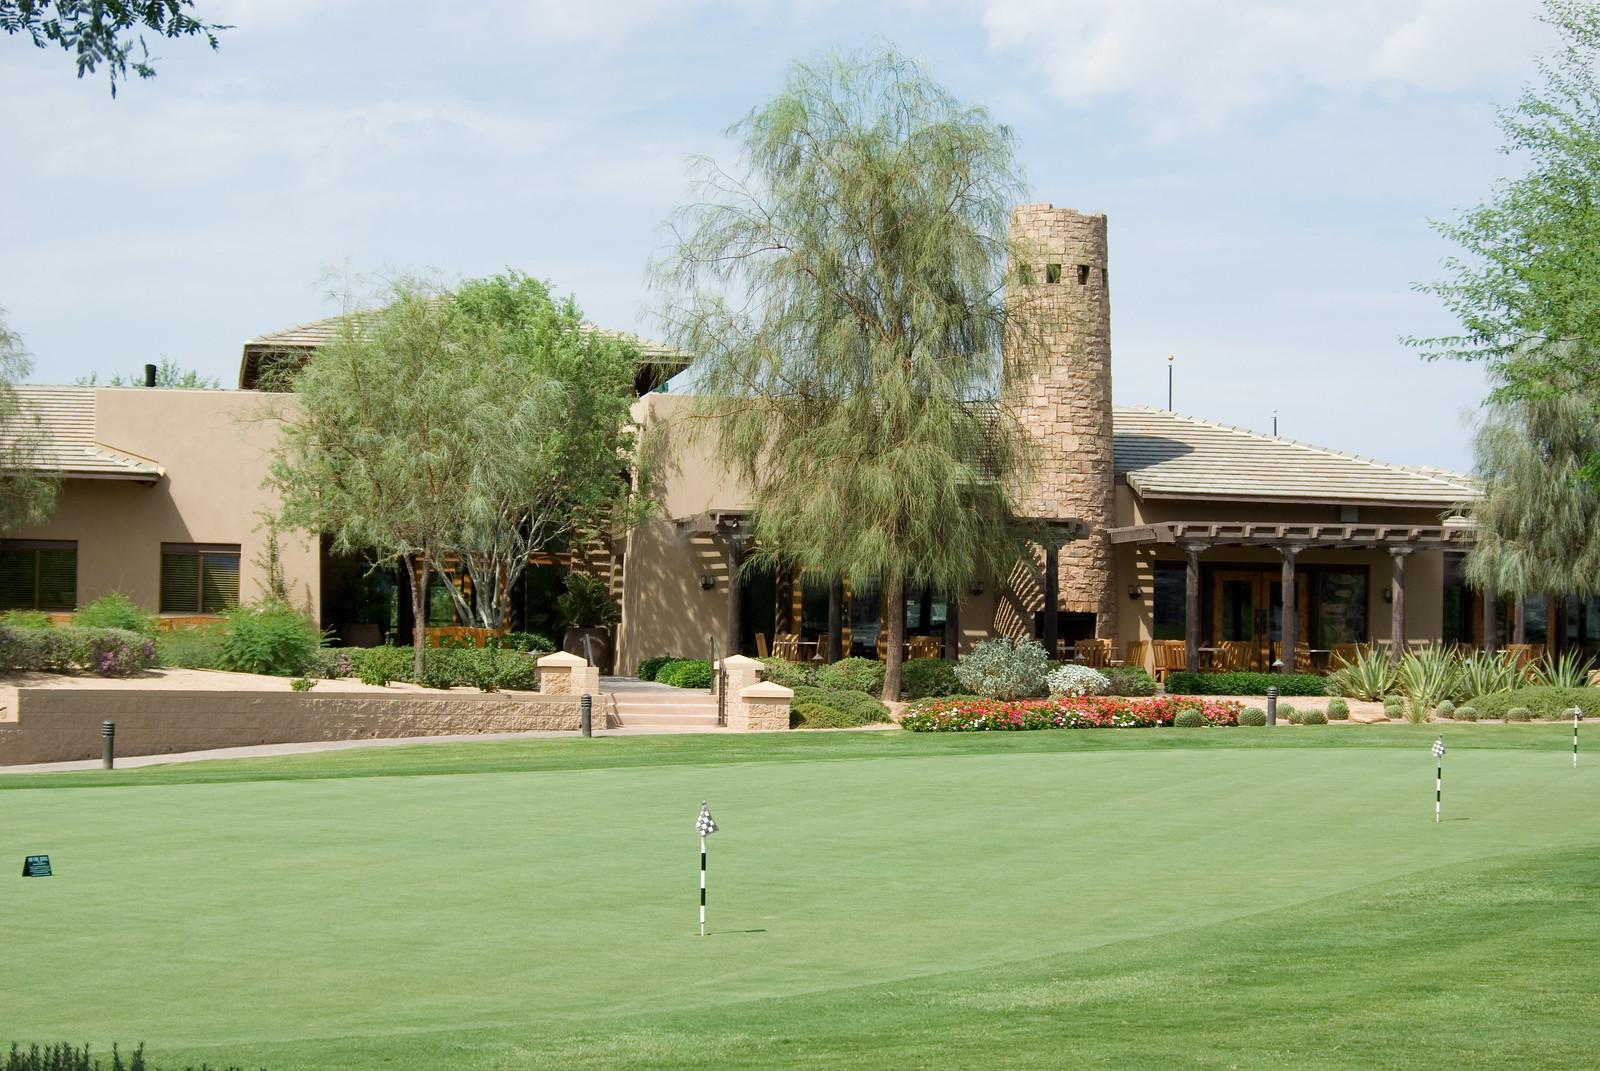 Westin Kierland Resort Golf Course Clubhouse & putting green - Scottsdale Arizona